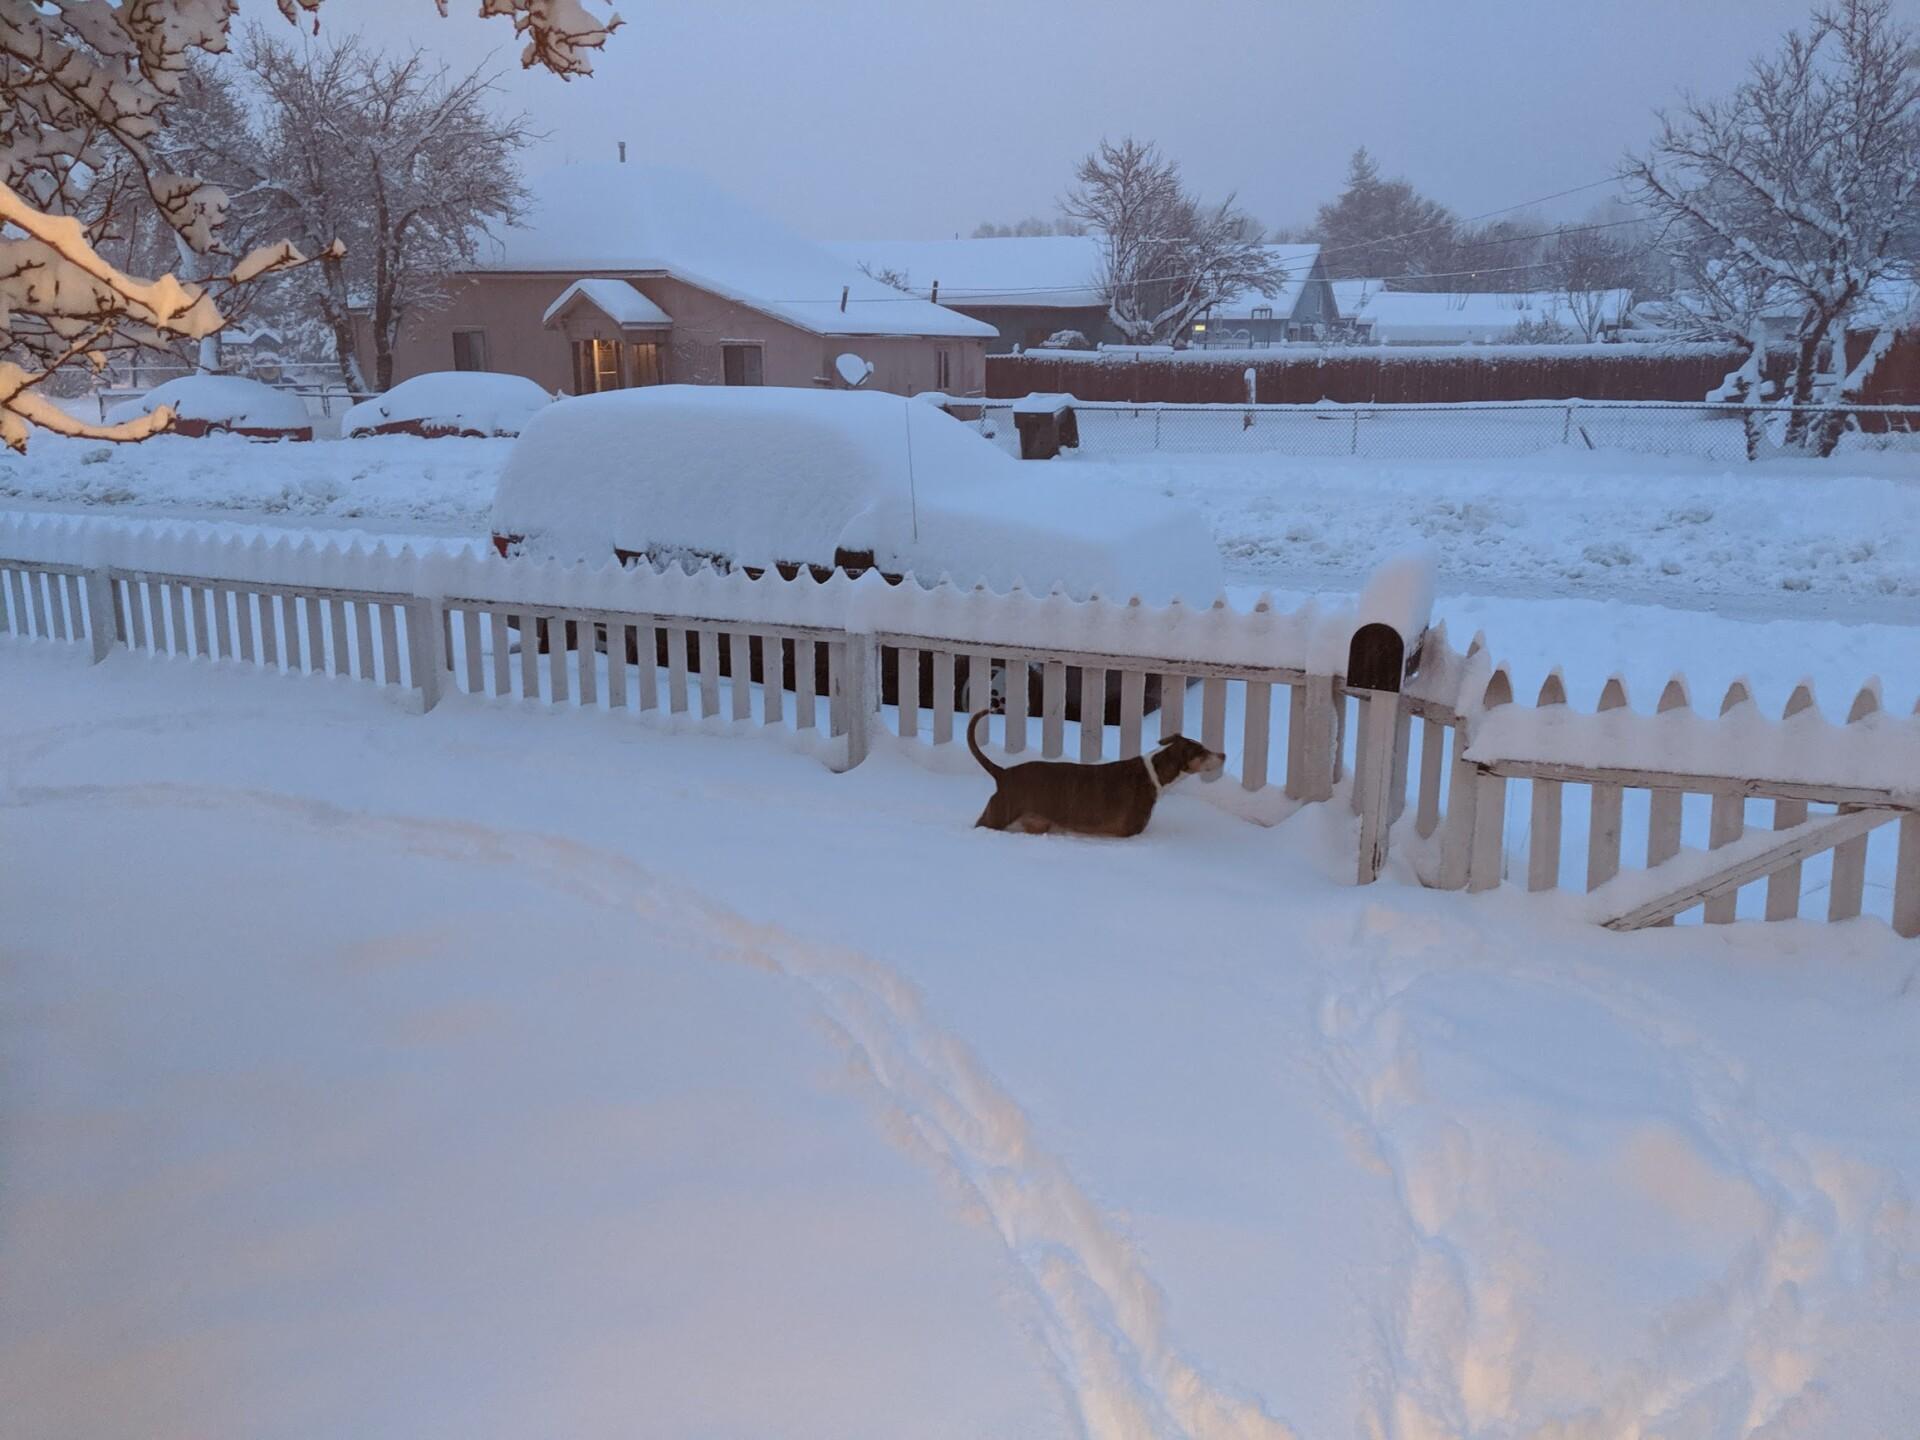 Toni_Simonsen_dog_in_snow_.jpg